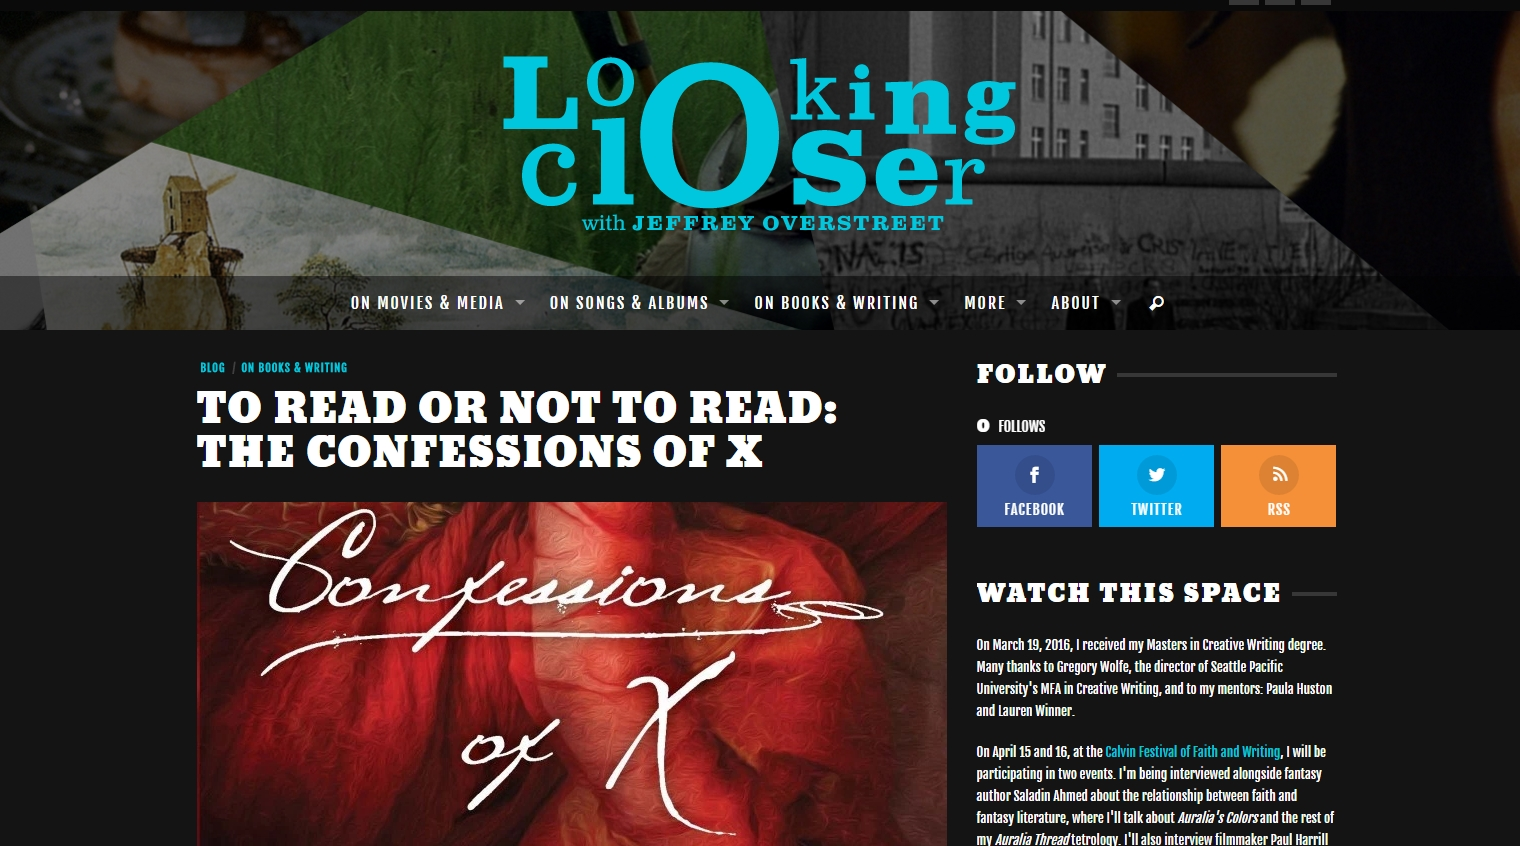 Overstreet Blog